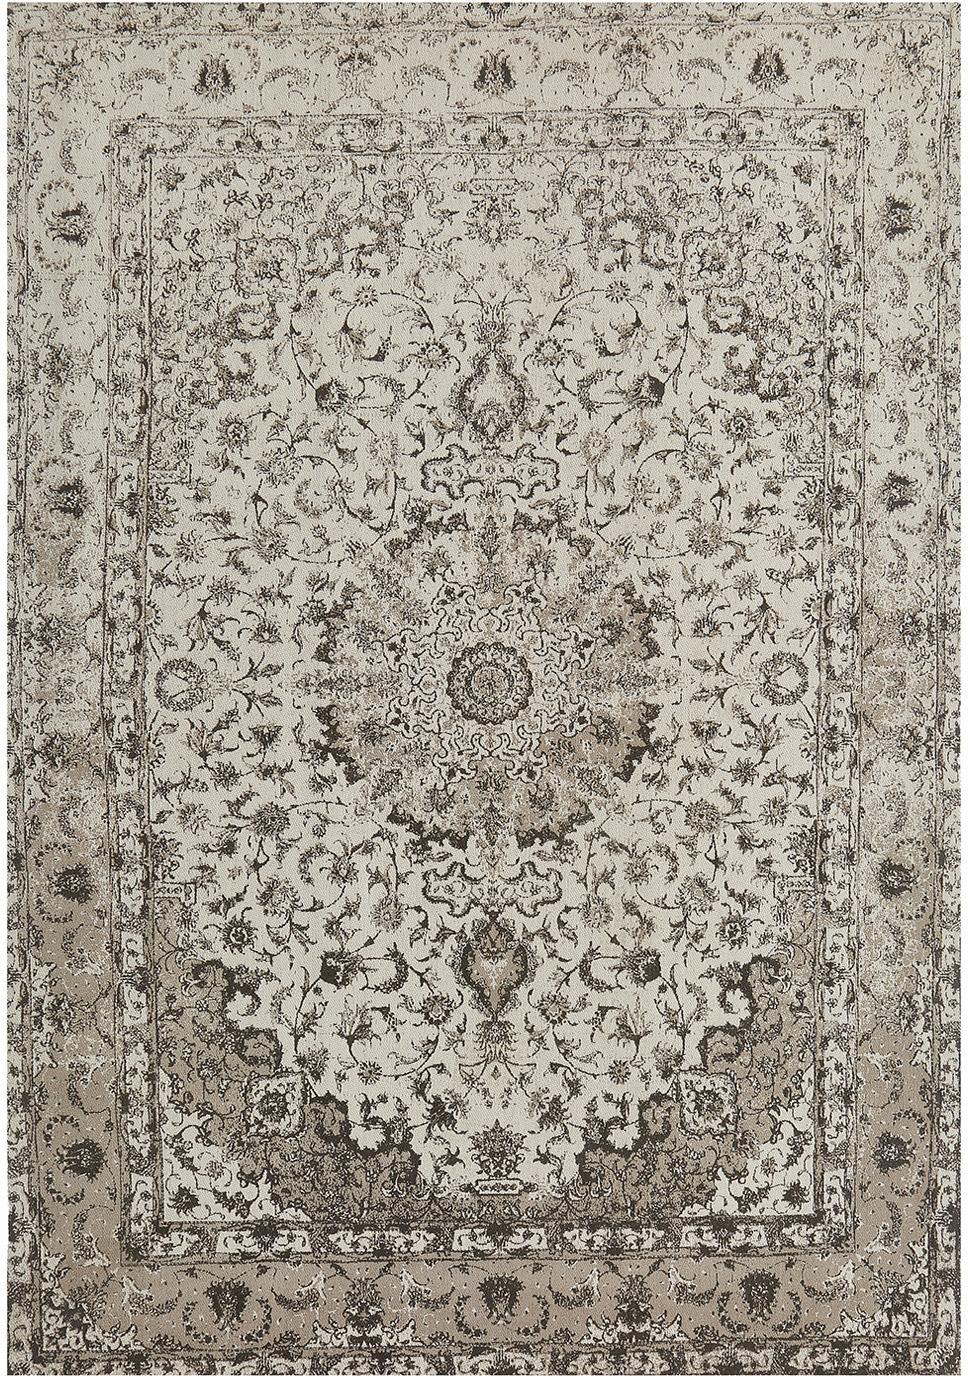 Vintage Chenilleteppich Sofia in Beige-Grau, handgewebt, Flor: 95% Baumwolle, 5% Polyest, Beige, Grau, B 160 x L 230 cm (Grösse M)